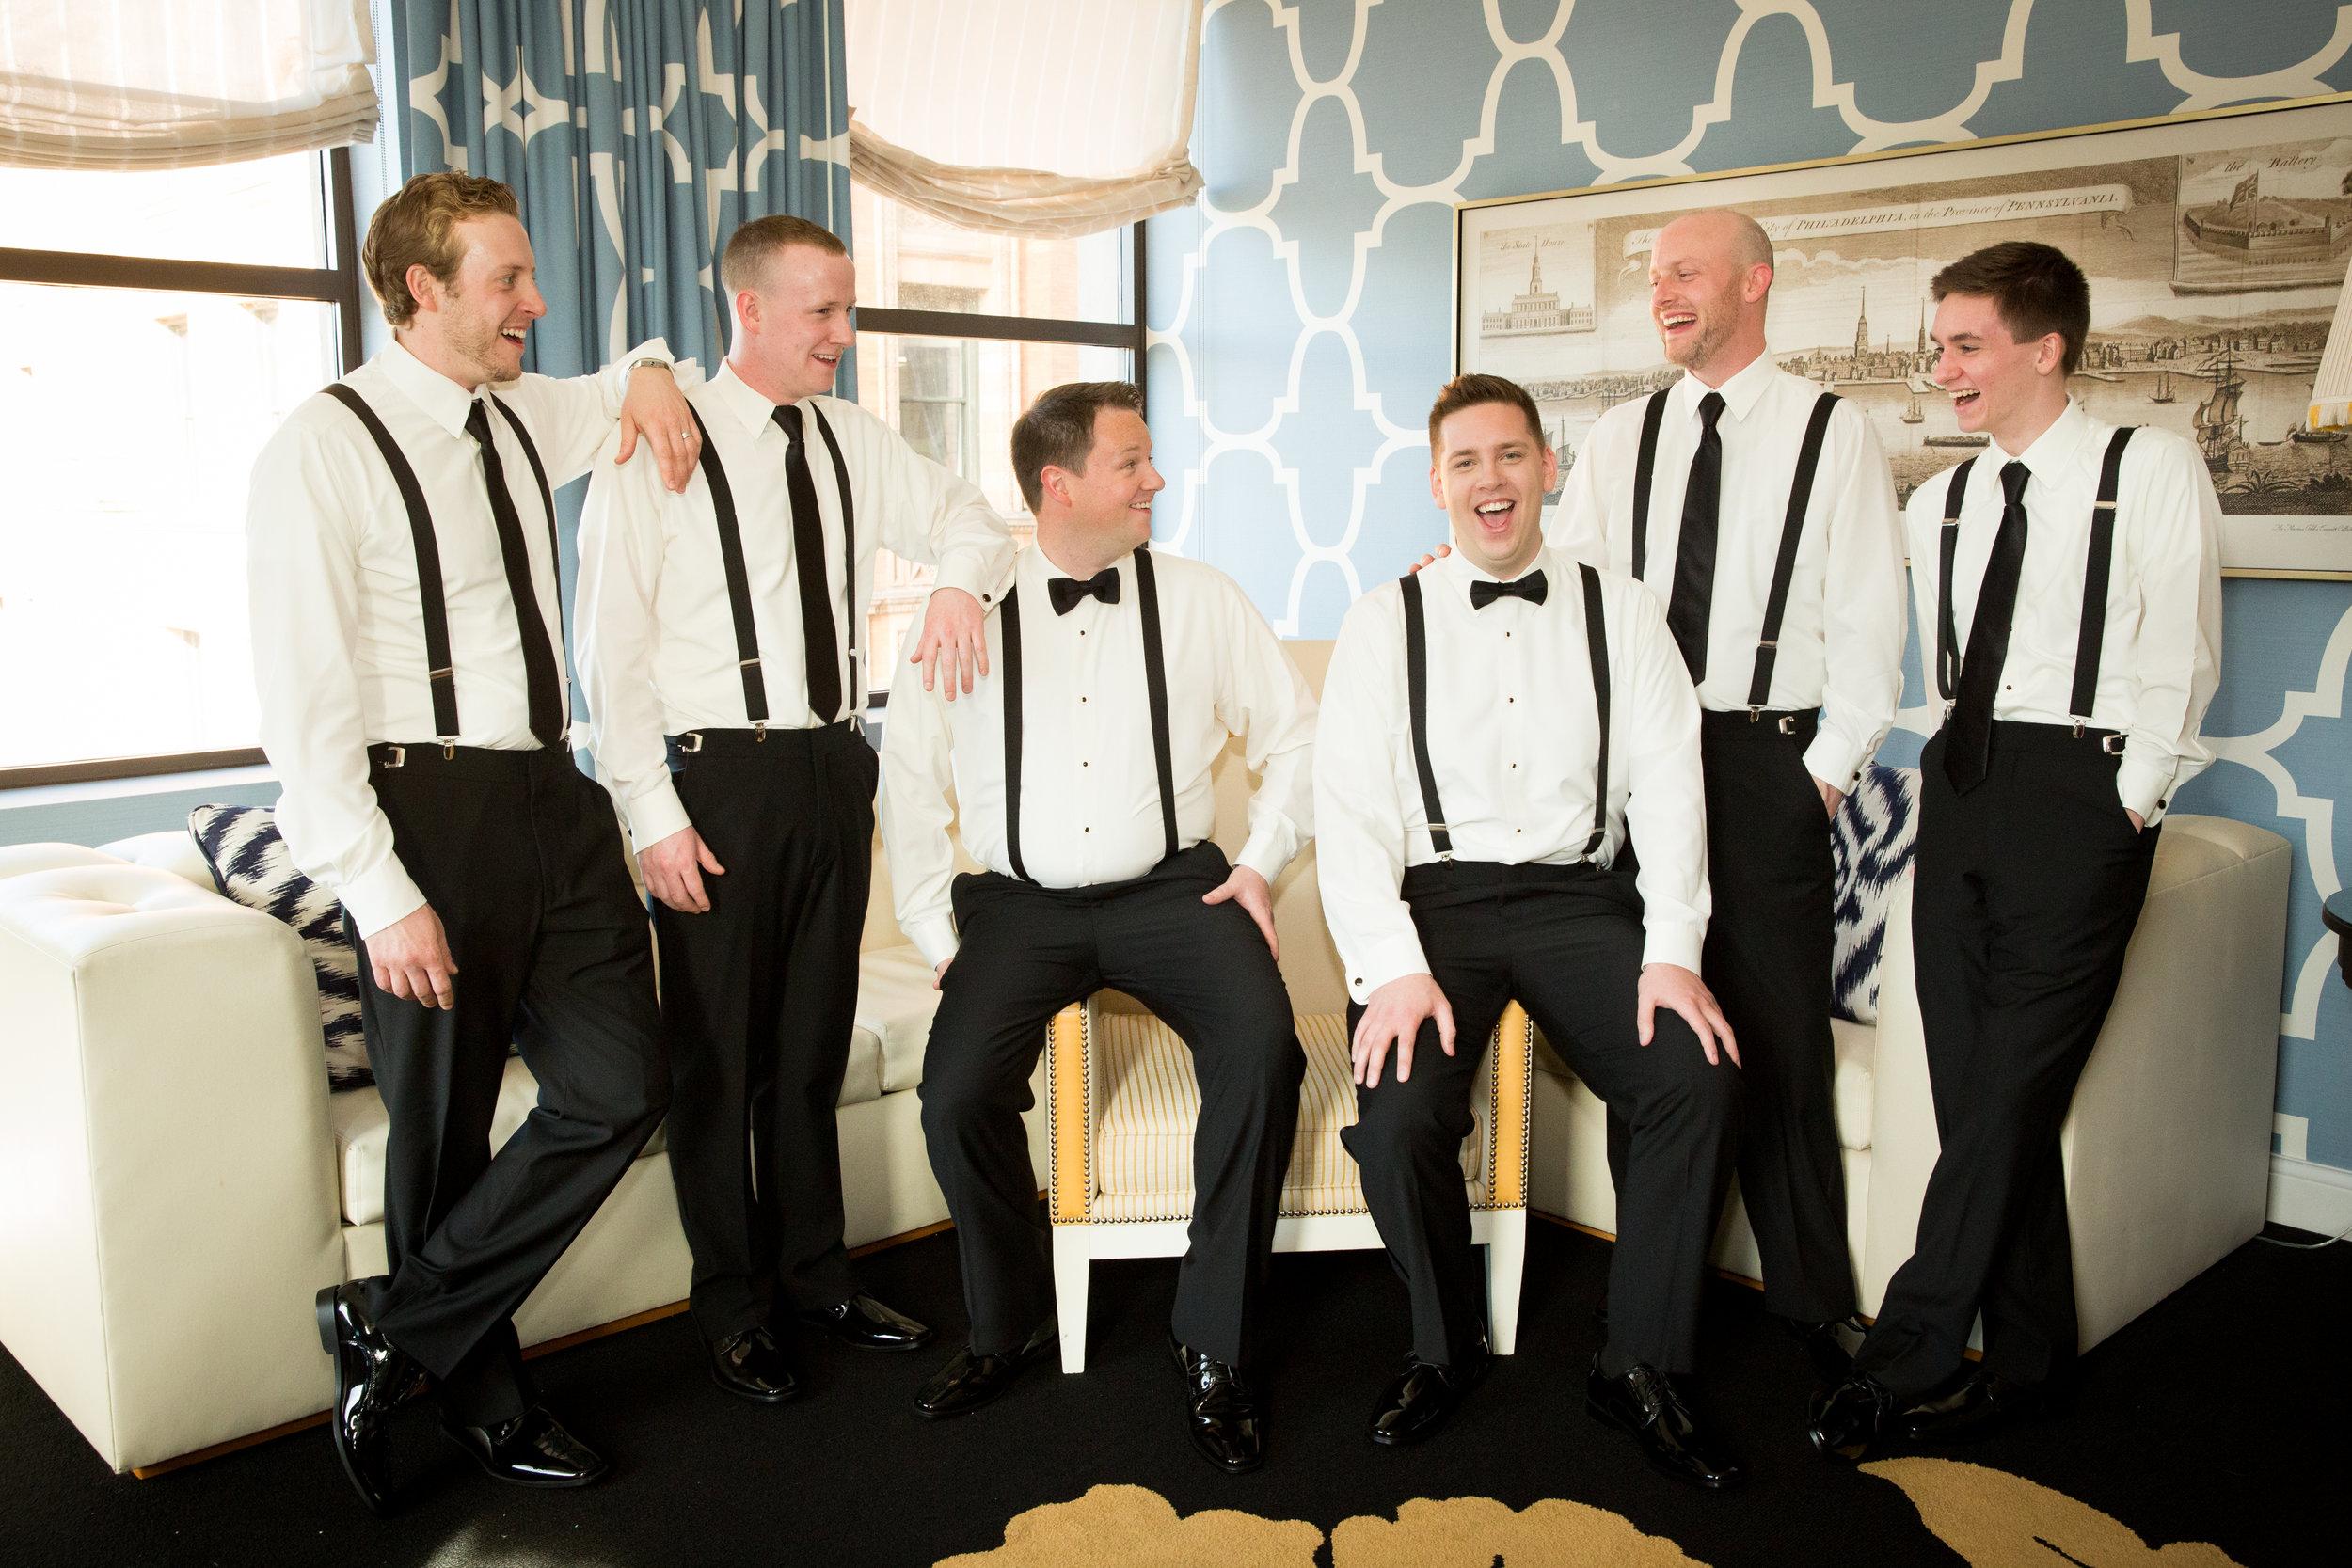 union-trust-philadelphia-same-sex-lgbt-wedding-zachary-andrew-events